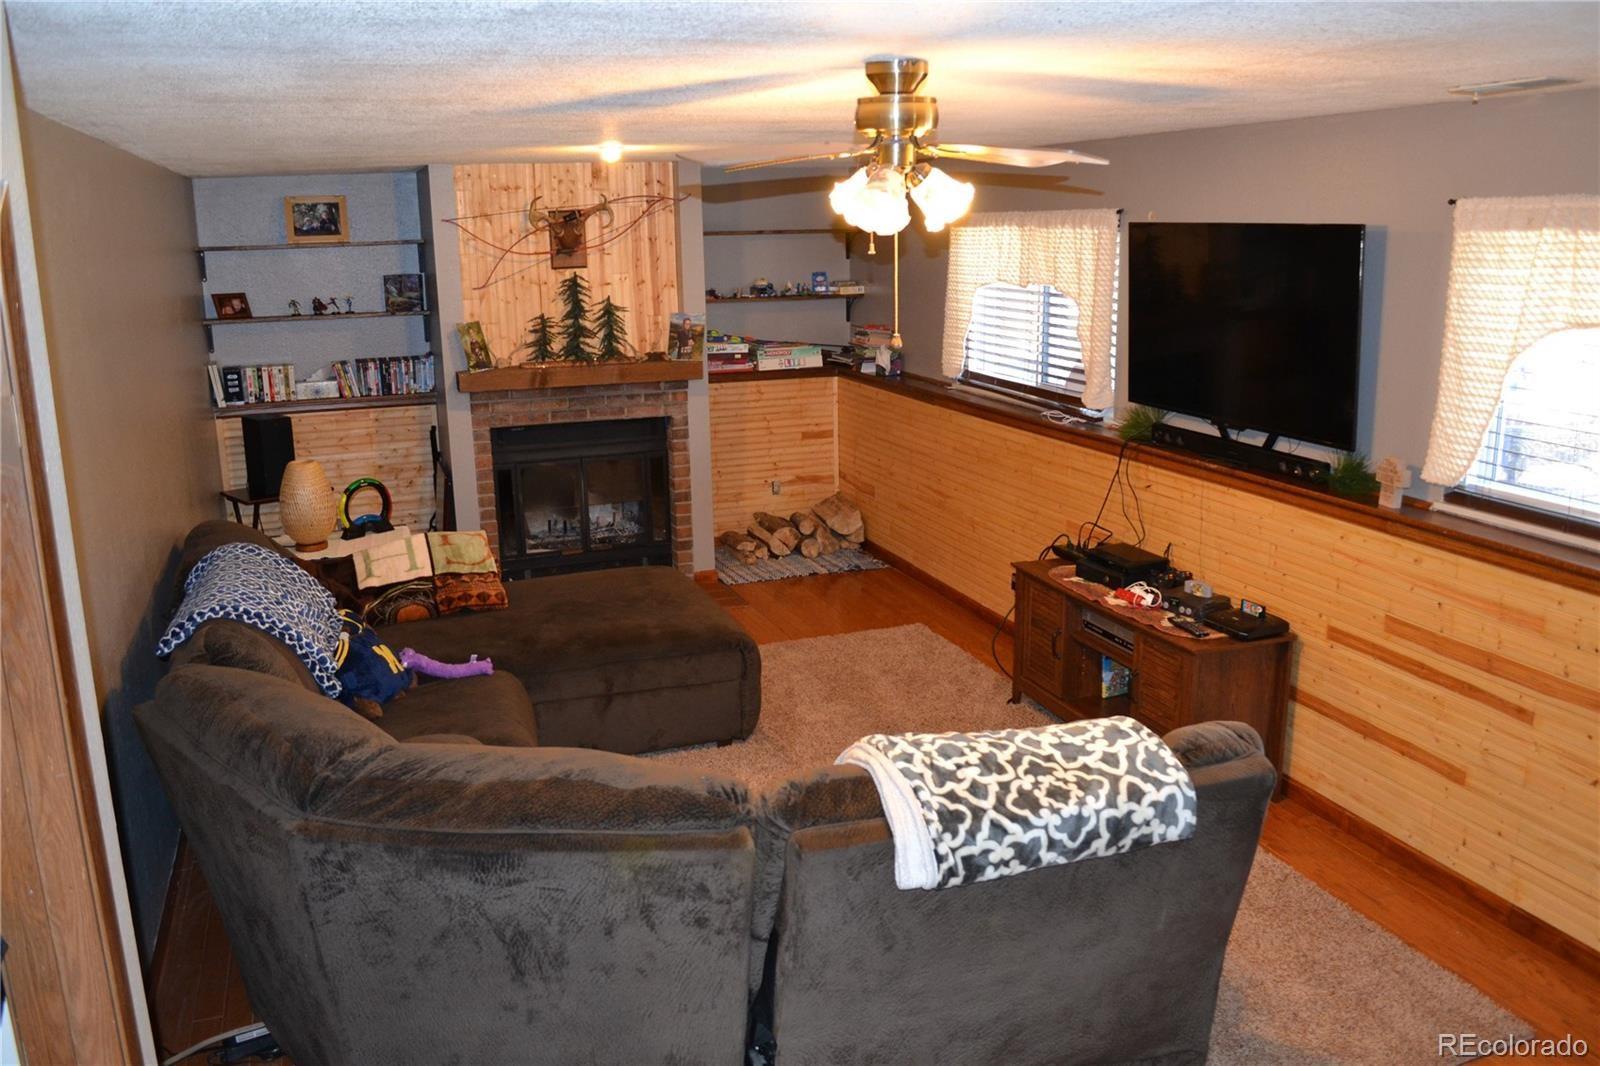 MLS# 4486712 - 8 - 5616 Trout Creek Pass Drive, Colorado Springs, CO 80917